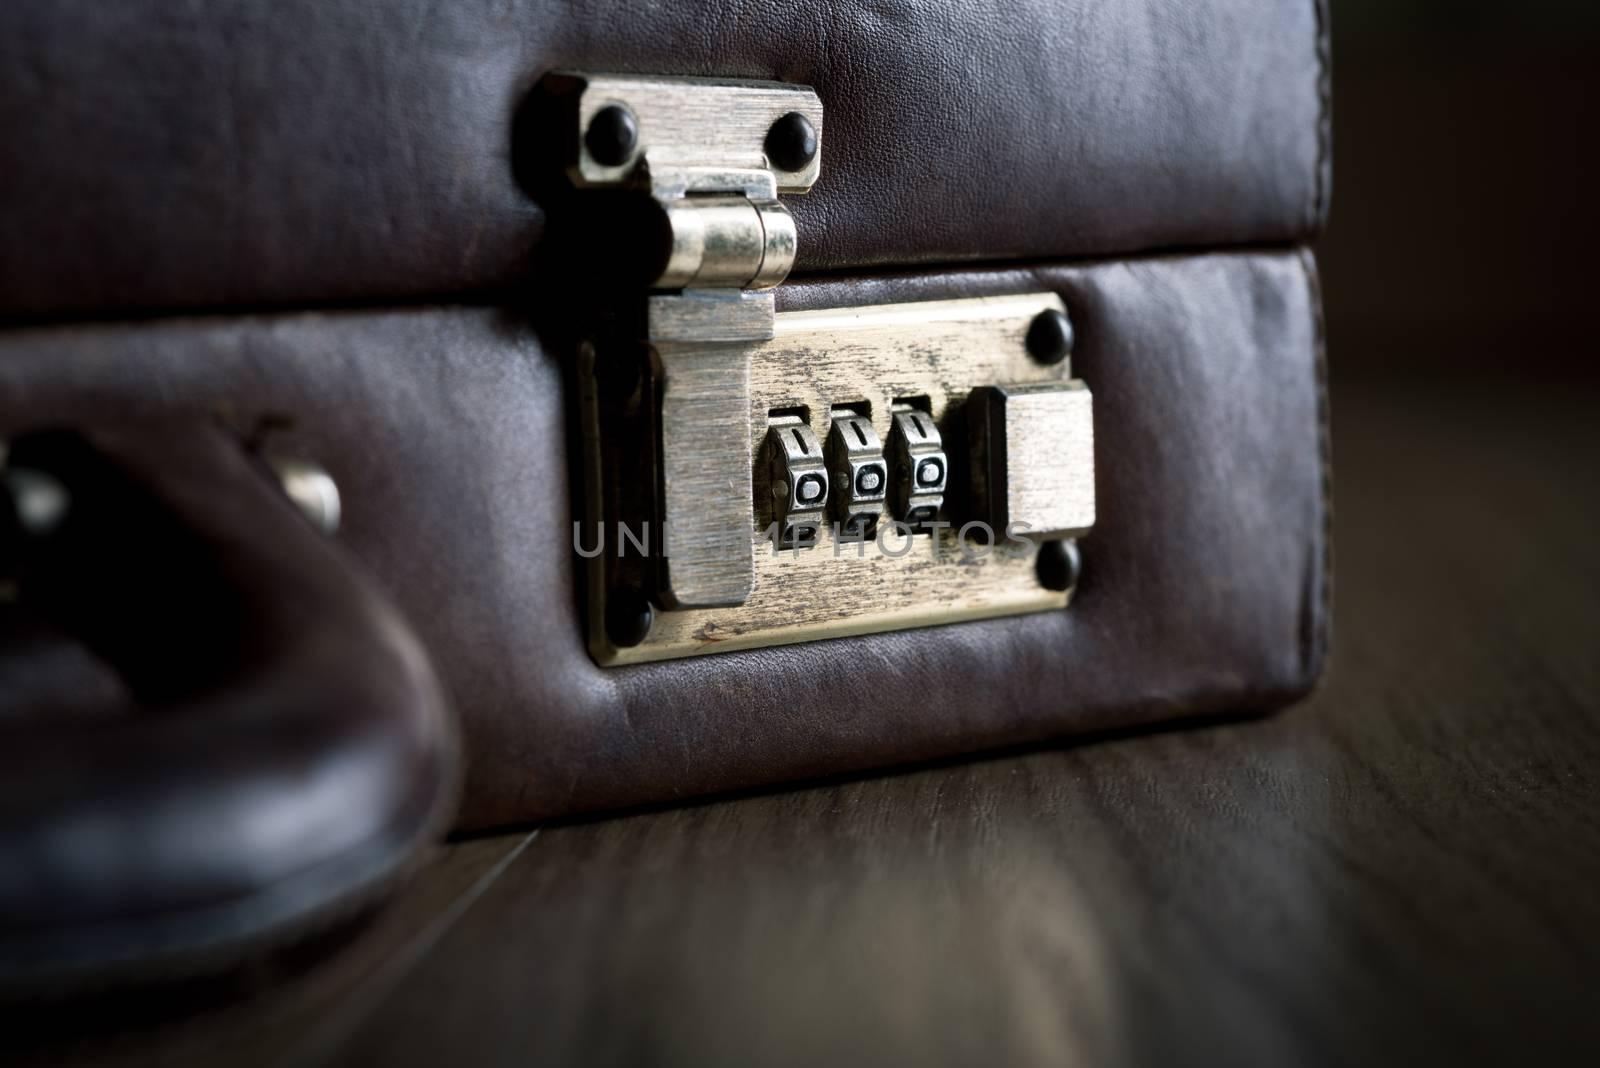 Leather briefcase lock and handle close-up on dark hardwood floor.